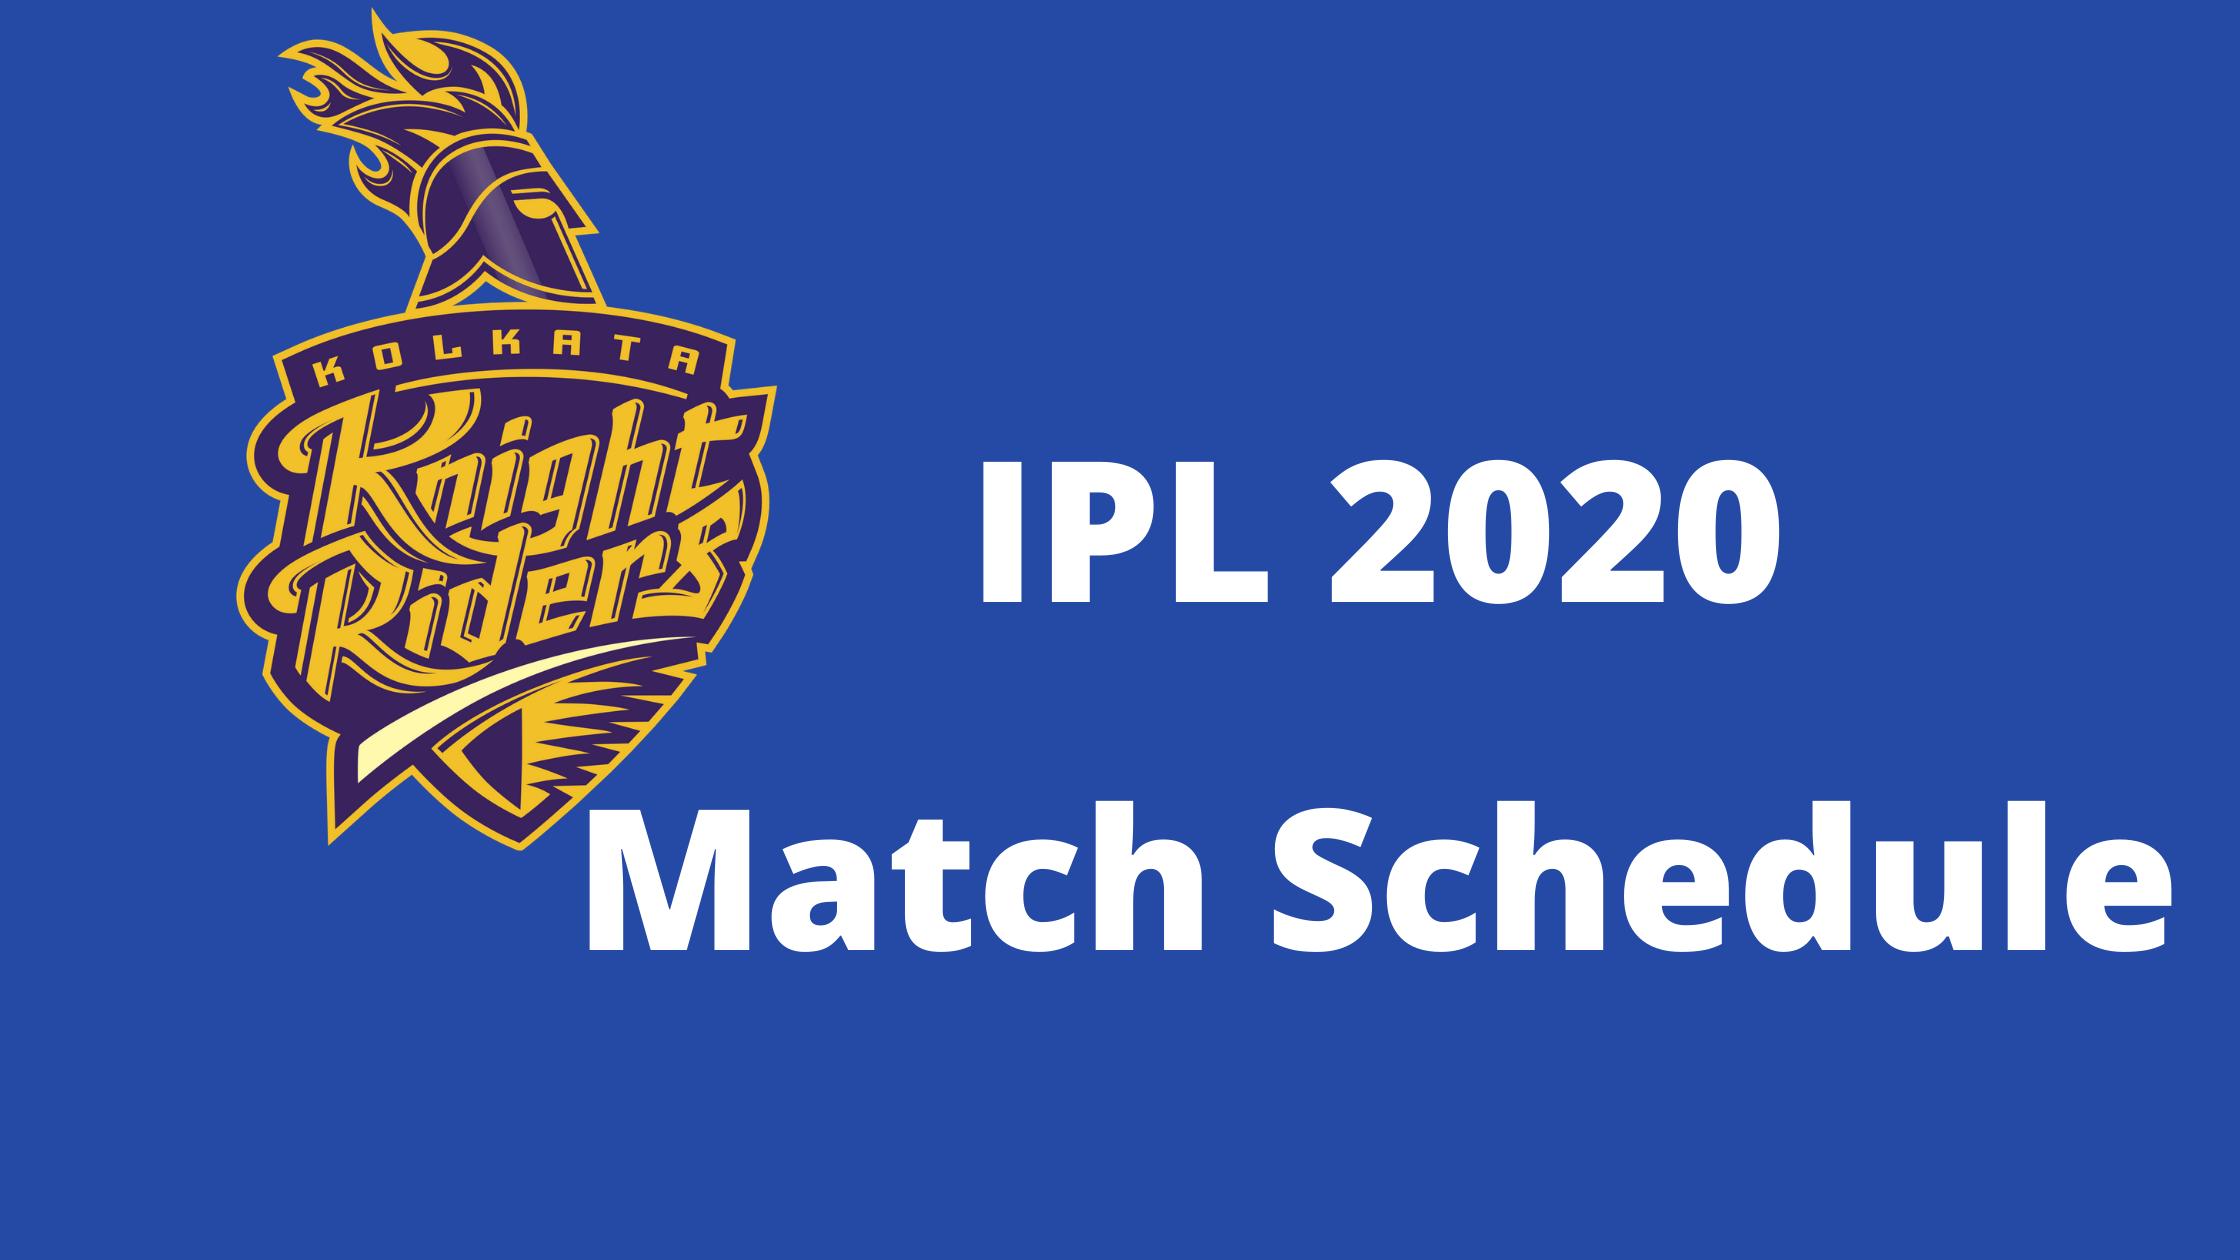 Dream11 IPL 2020 Kolkata Knight Riders Match Schedule